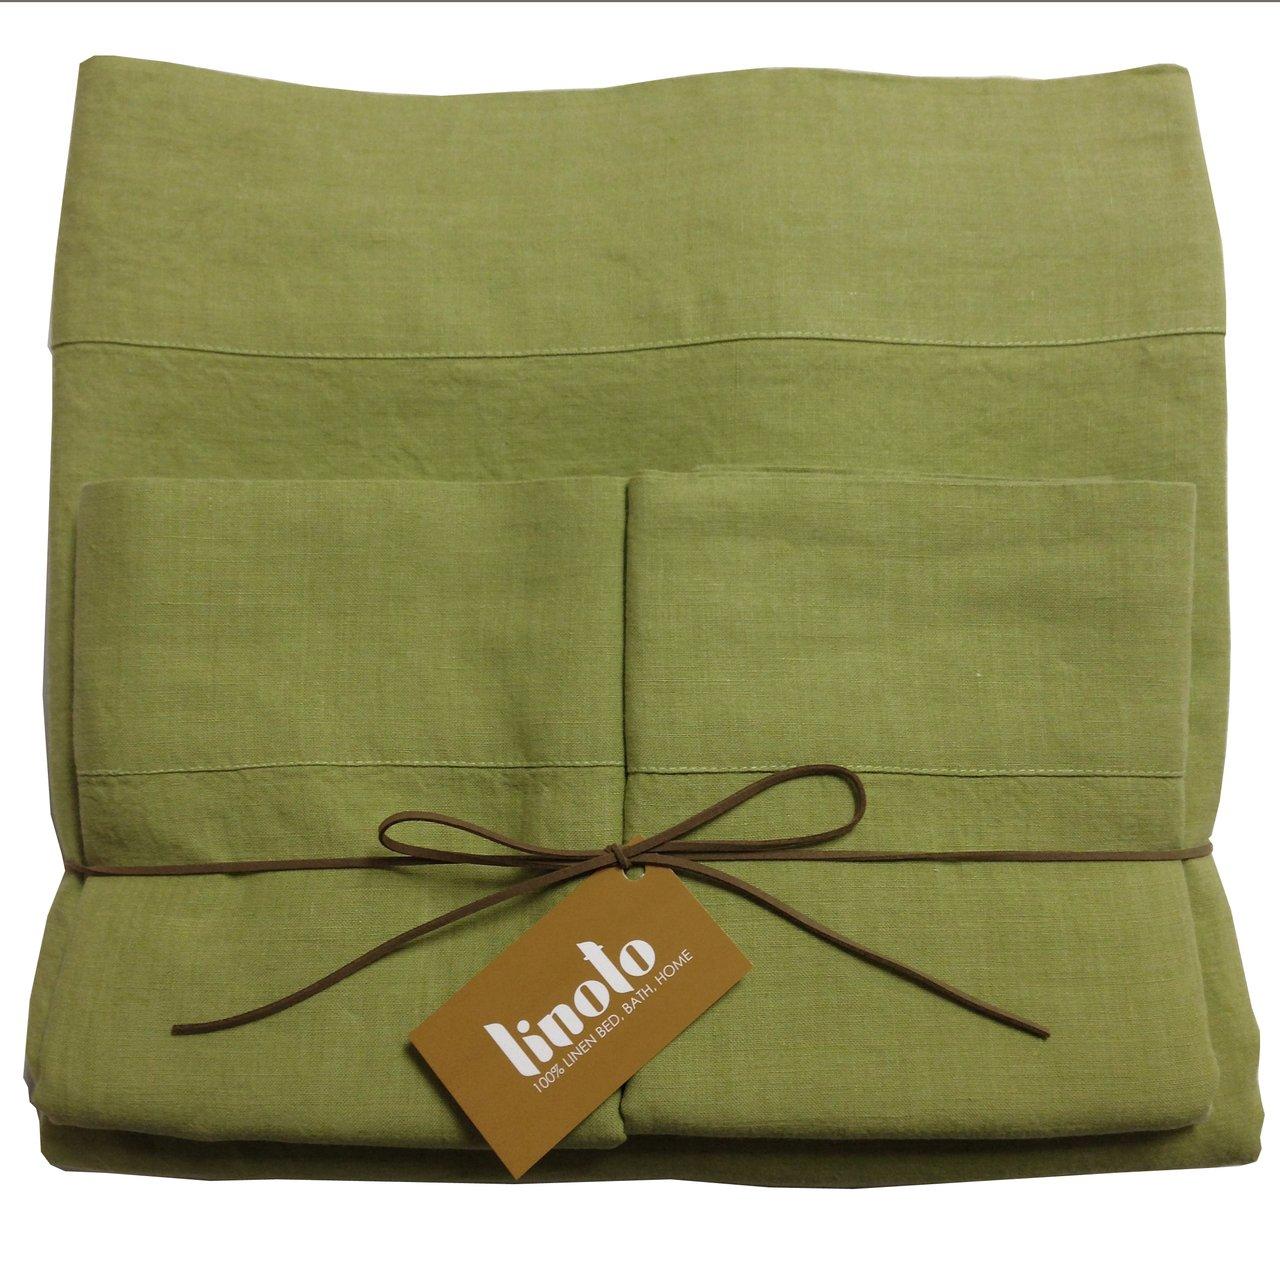 King Linoto Luxurious 100/% Pure Linen Bed Sheet Set Natural 4 Piece Indigo